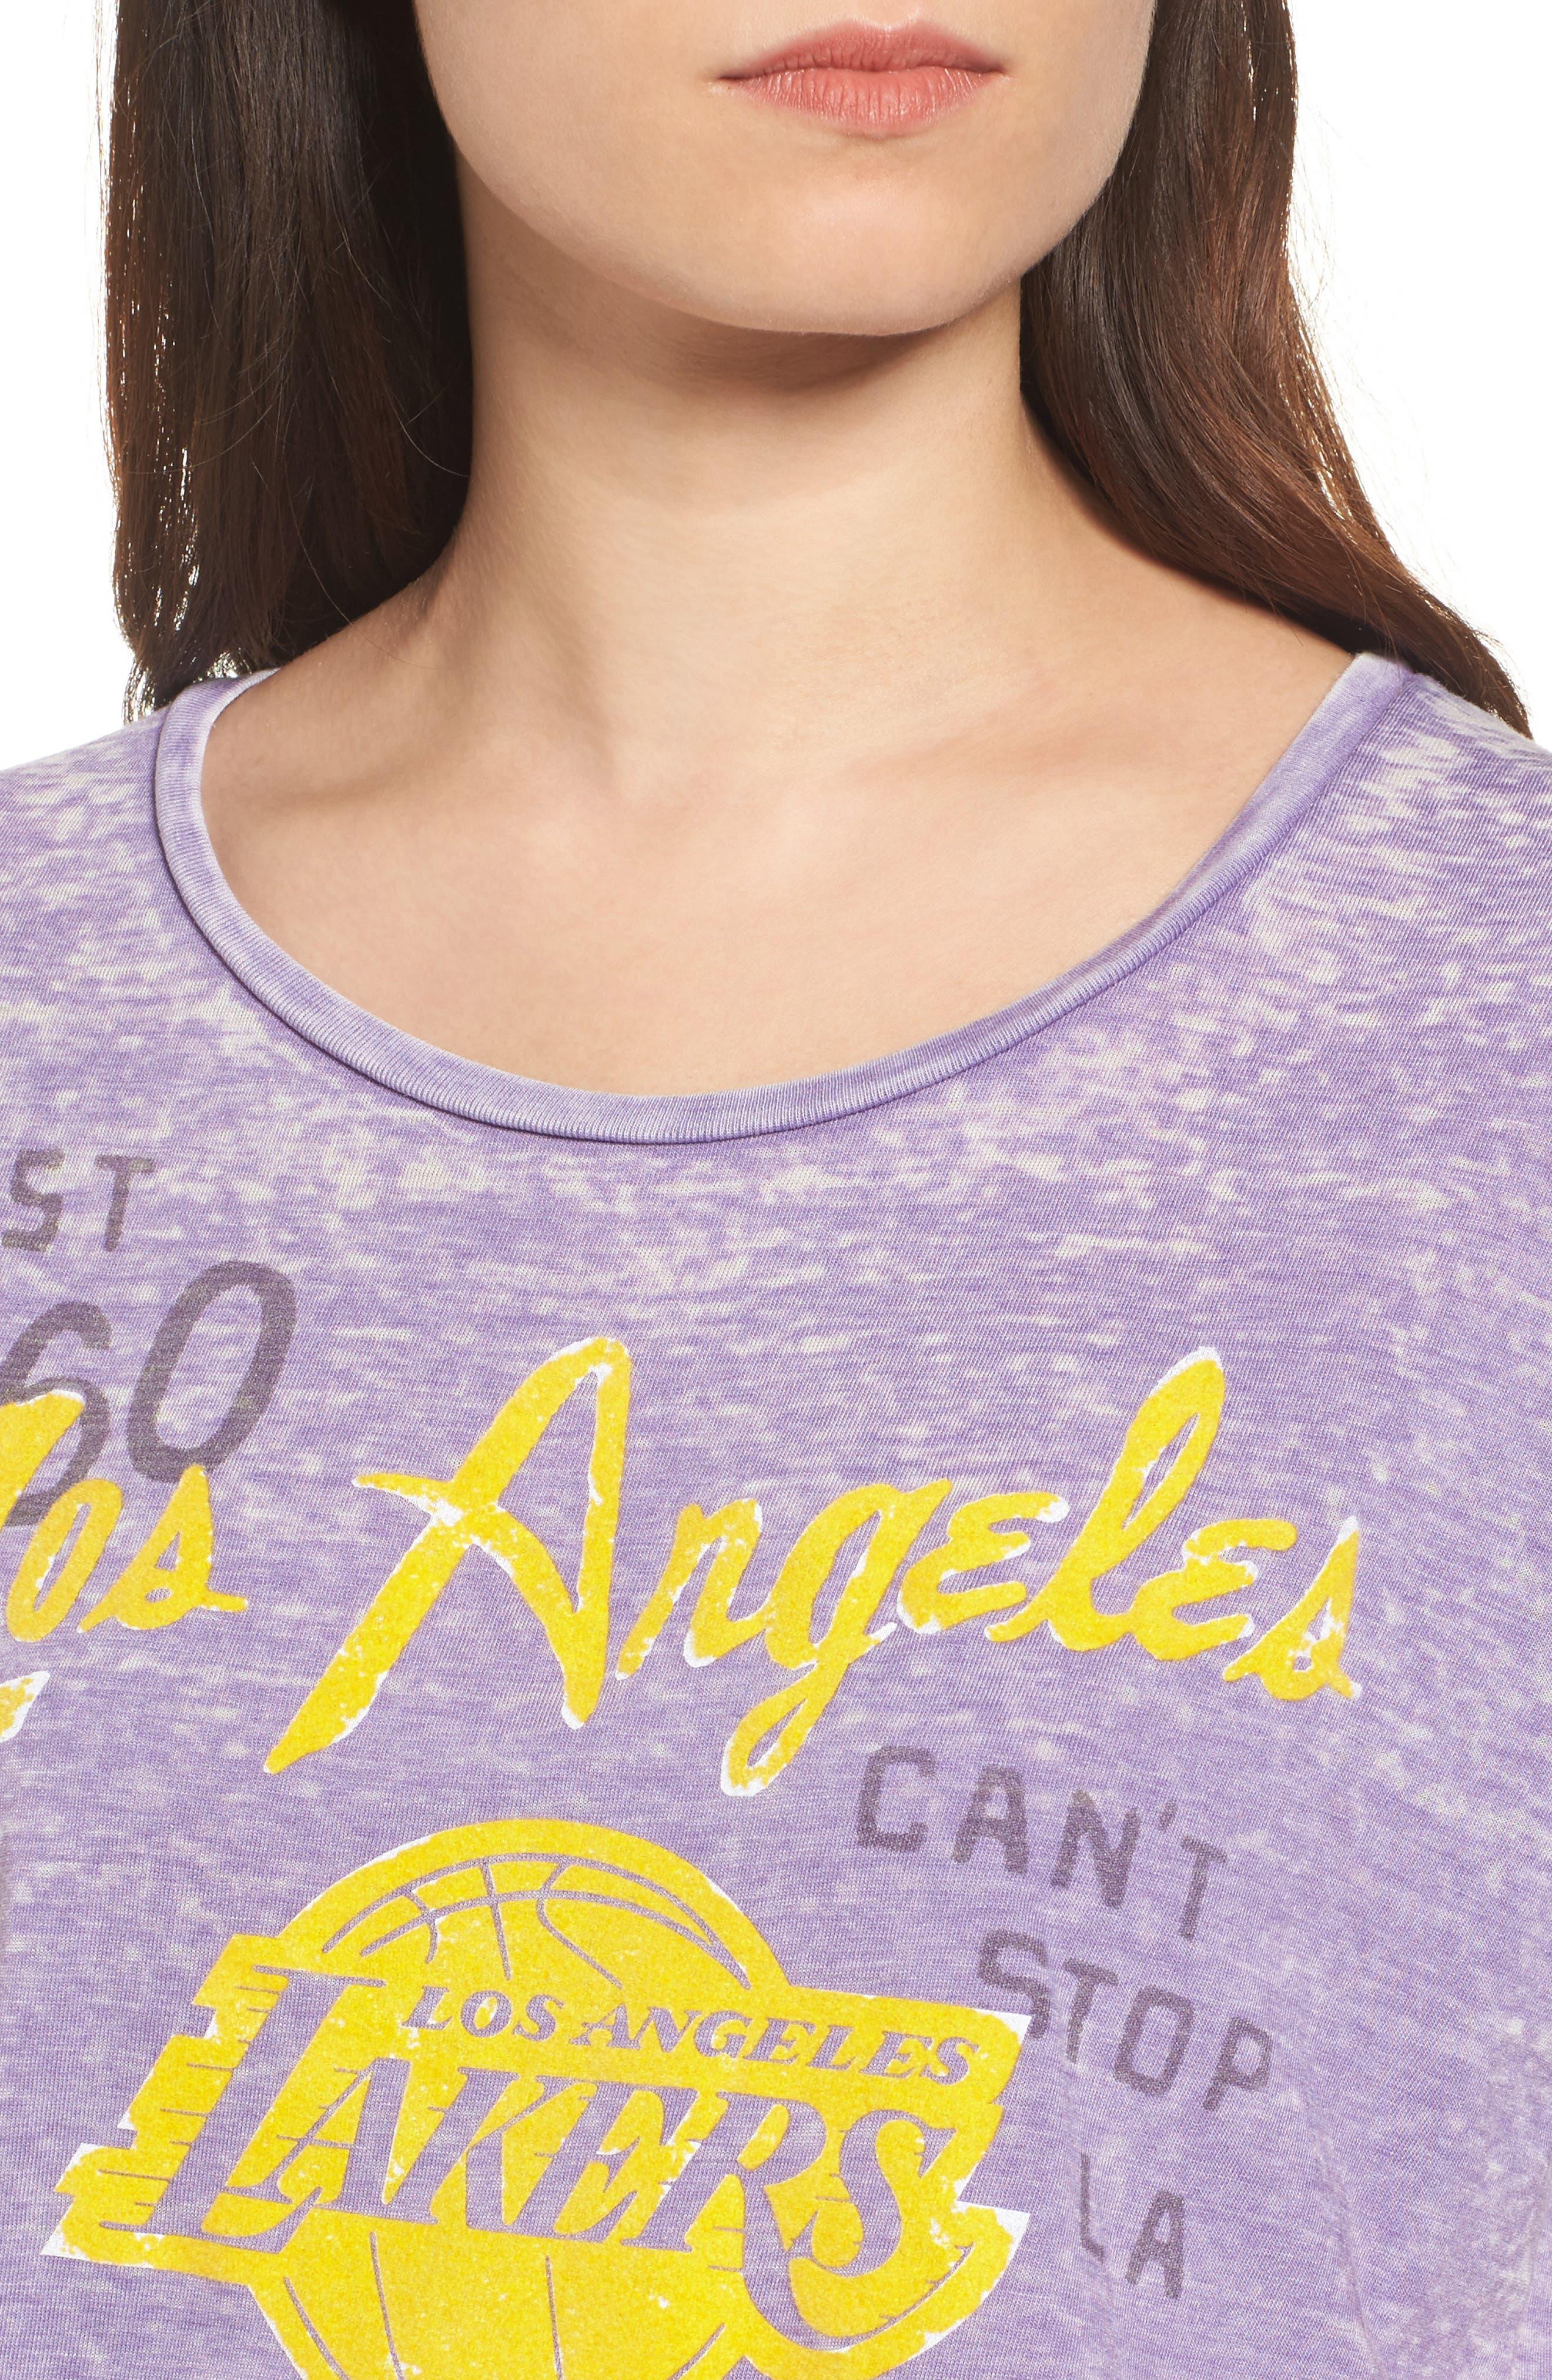 NBA Los Angeles Lakers Tee,                             Alternate thumbnail 4, color,                             Plum